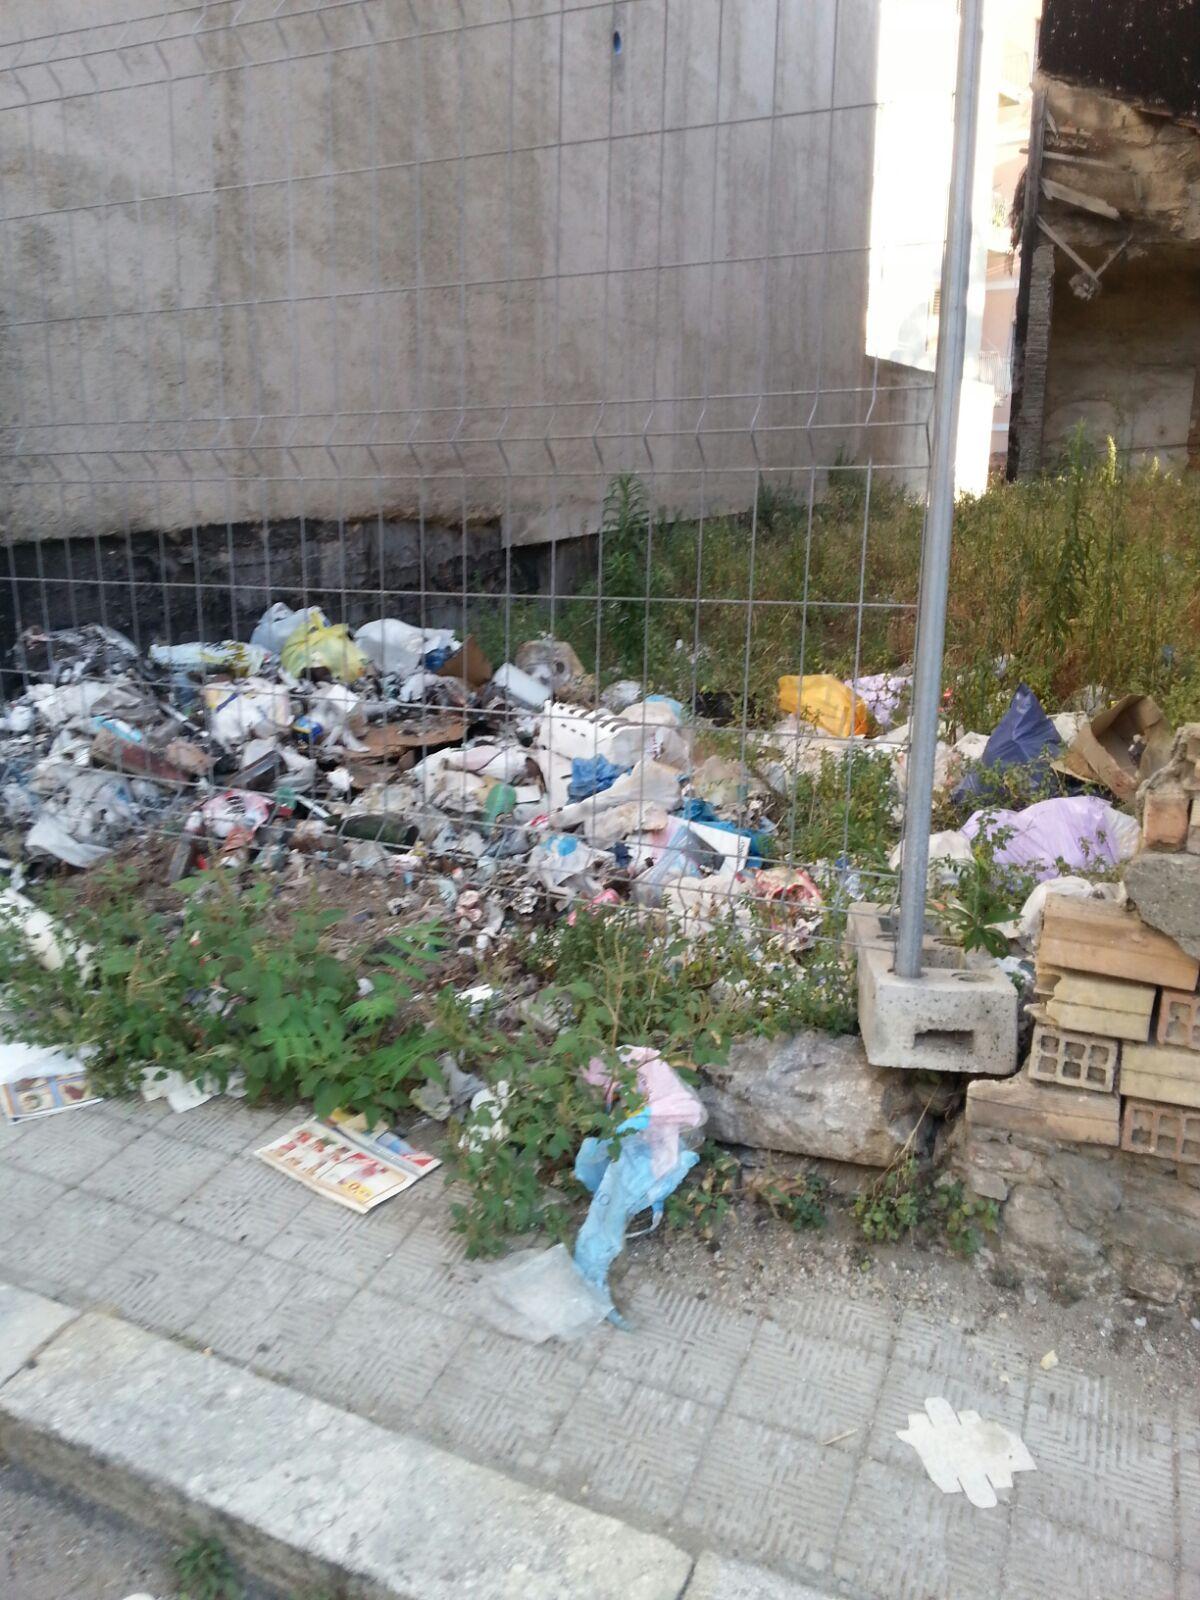 Reggio - Via Vecchio cimitero invasa da immondizia, blatte e topi